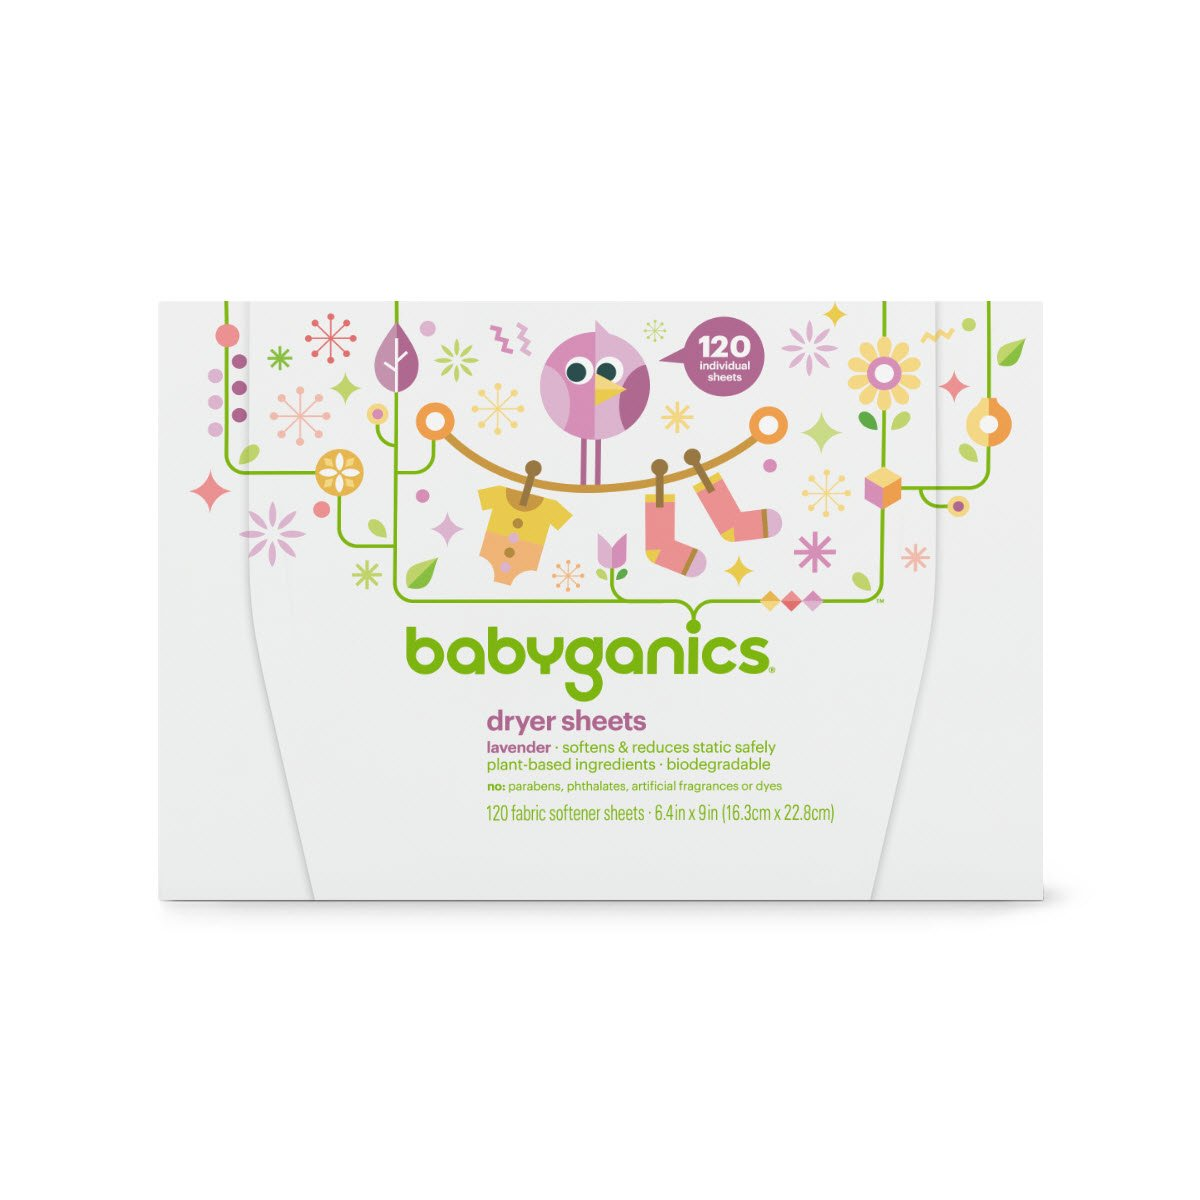 Amazon.com: Babyganics Dryer Sheets, 120 count, Packaging May Vary ...